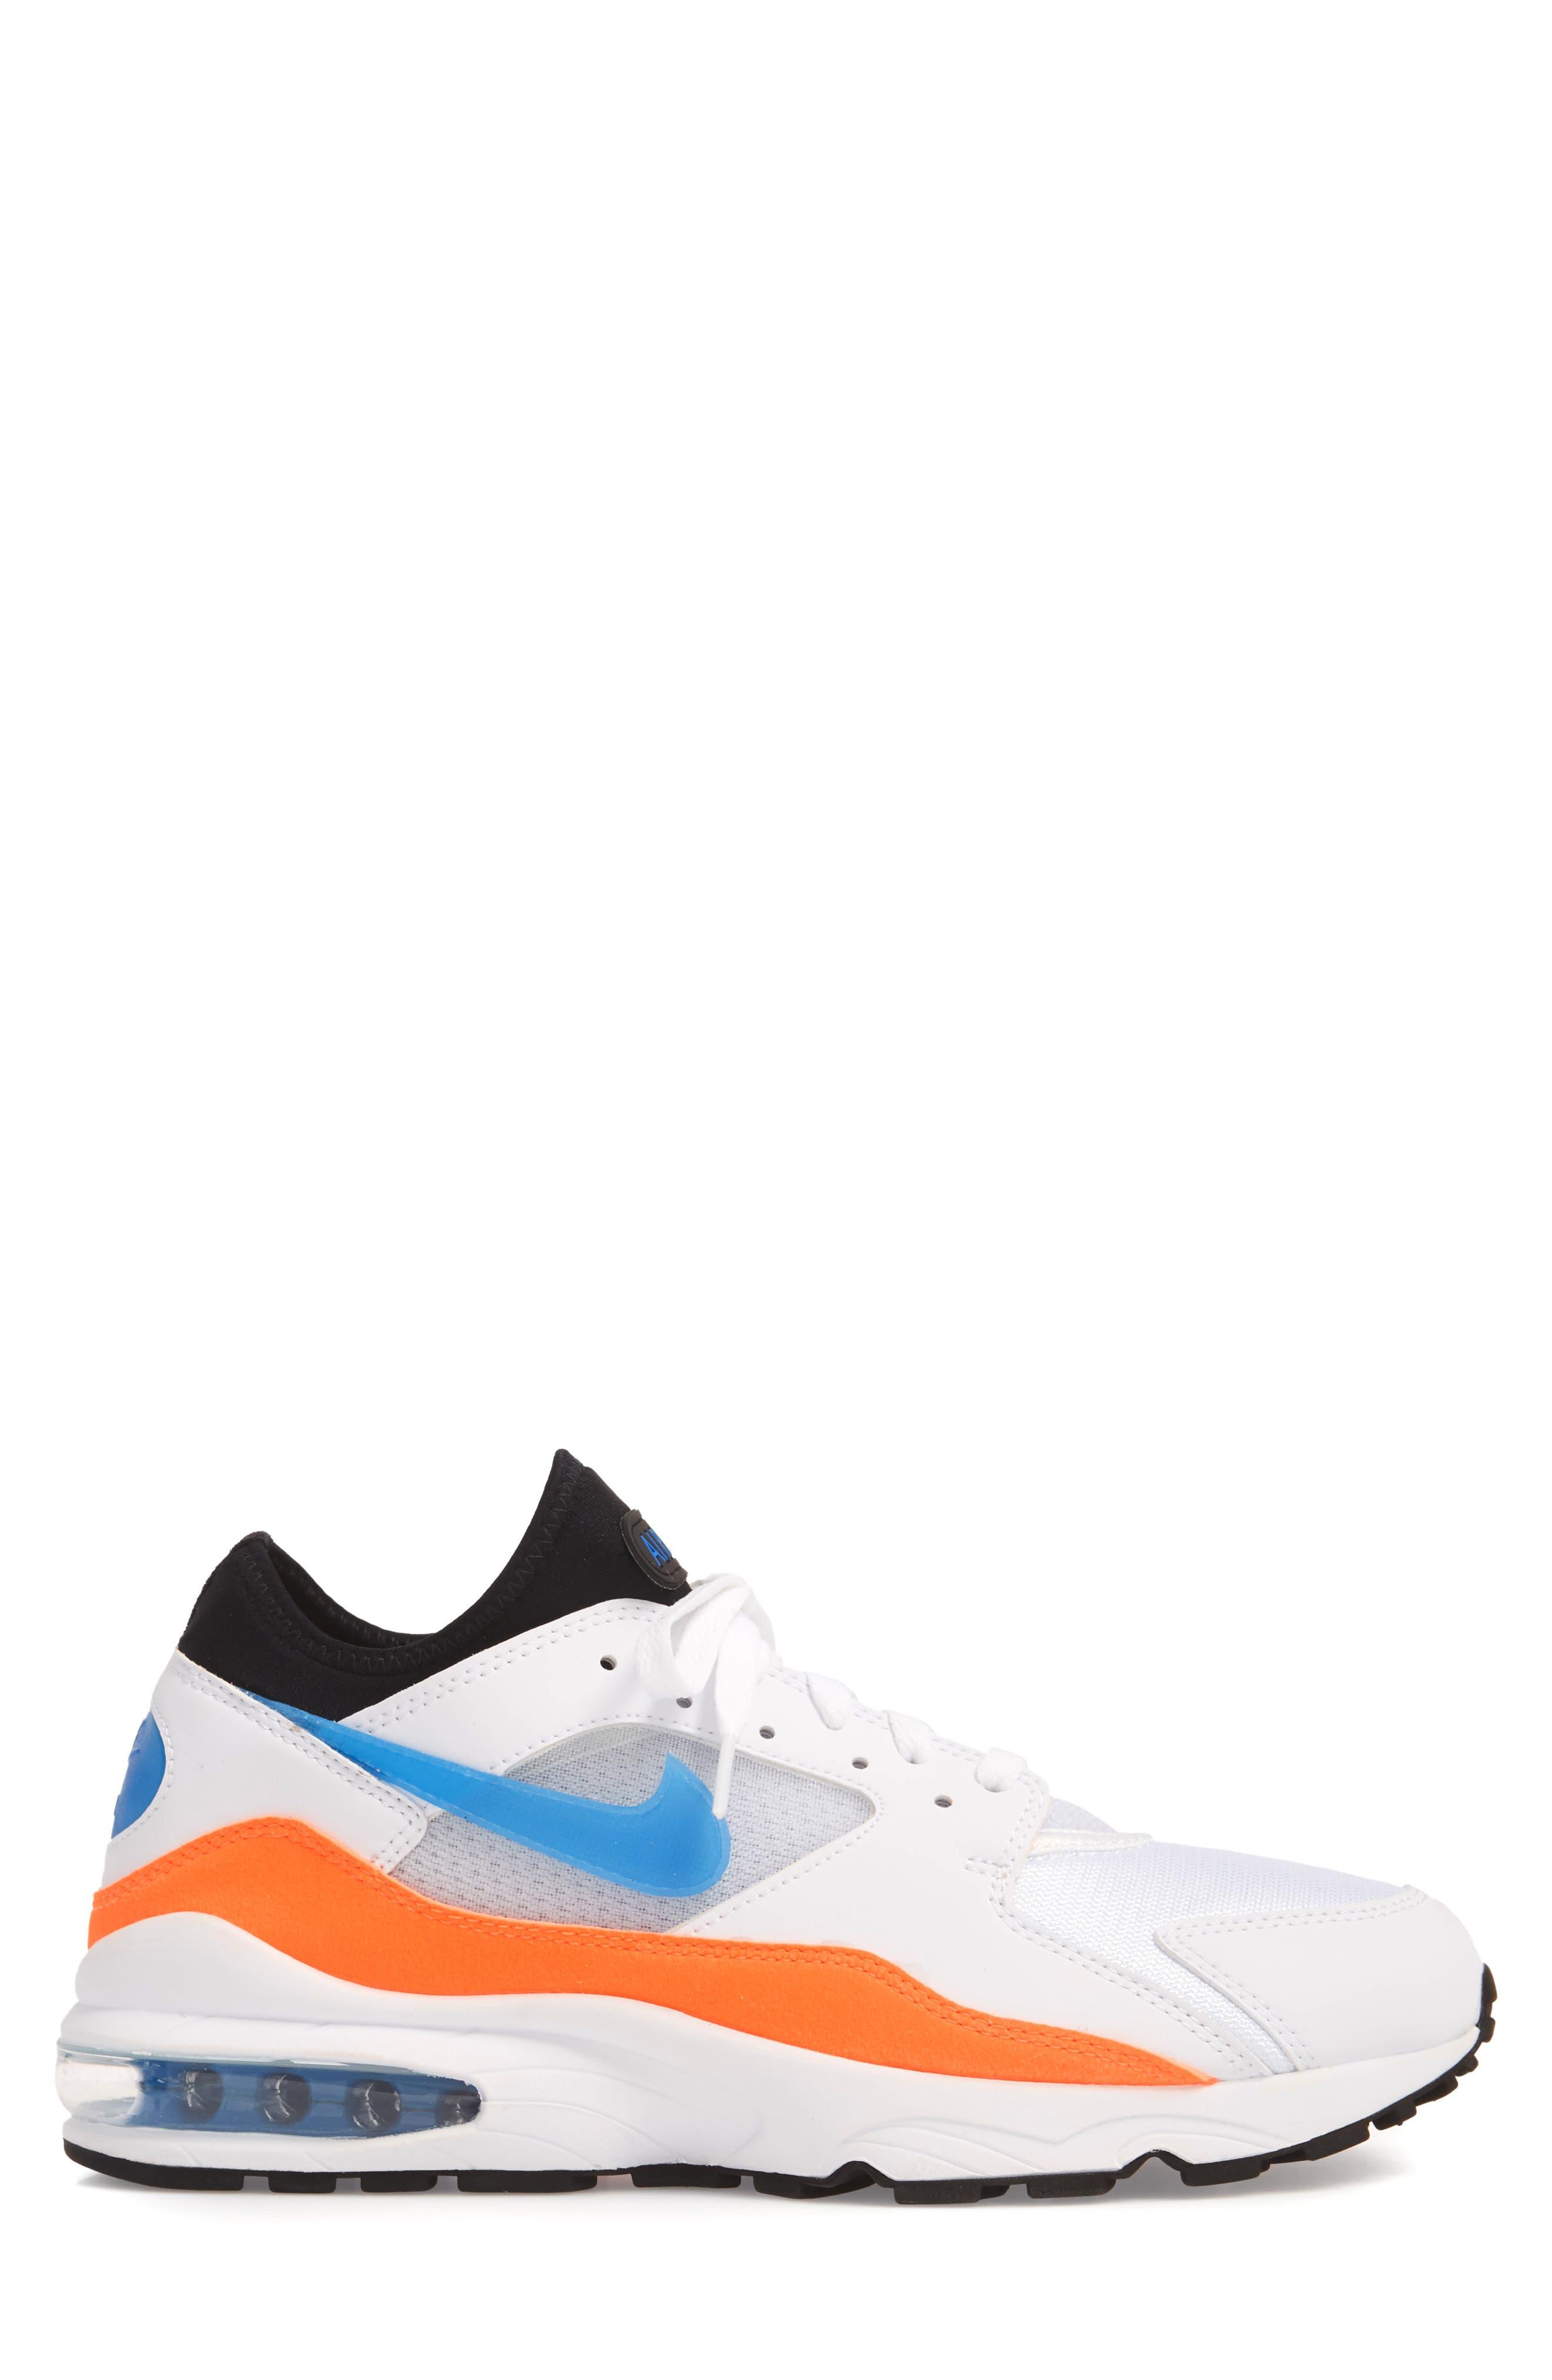 Air Max 93 Sneaker,                             Alternate thumbnail 6, color,                             White/ Blue Nebula/ Orange